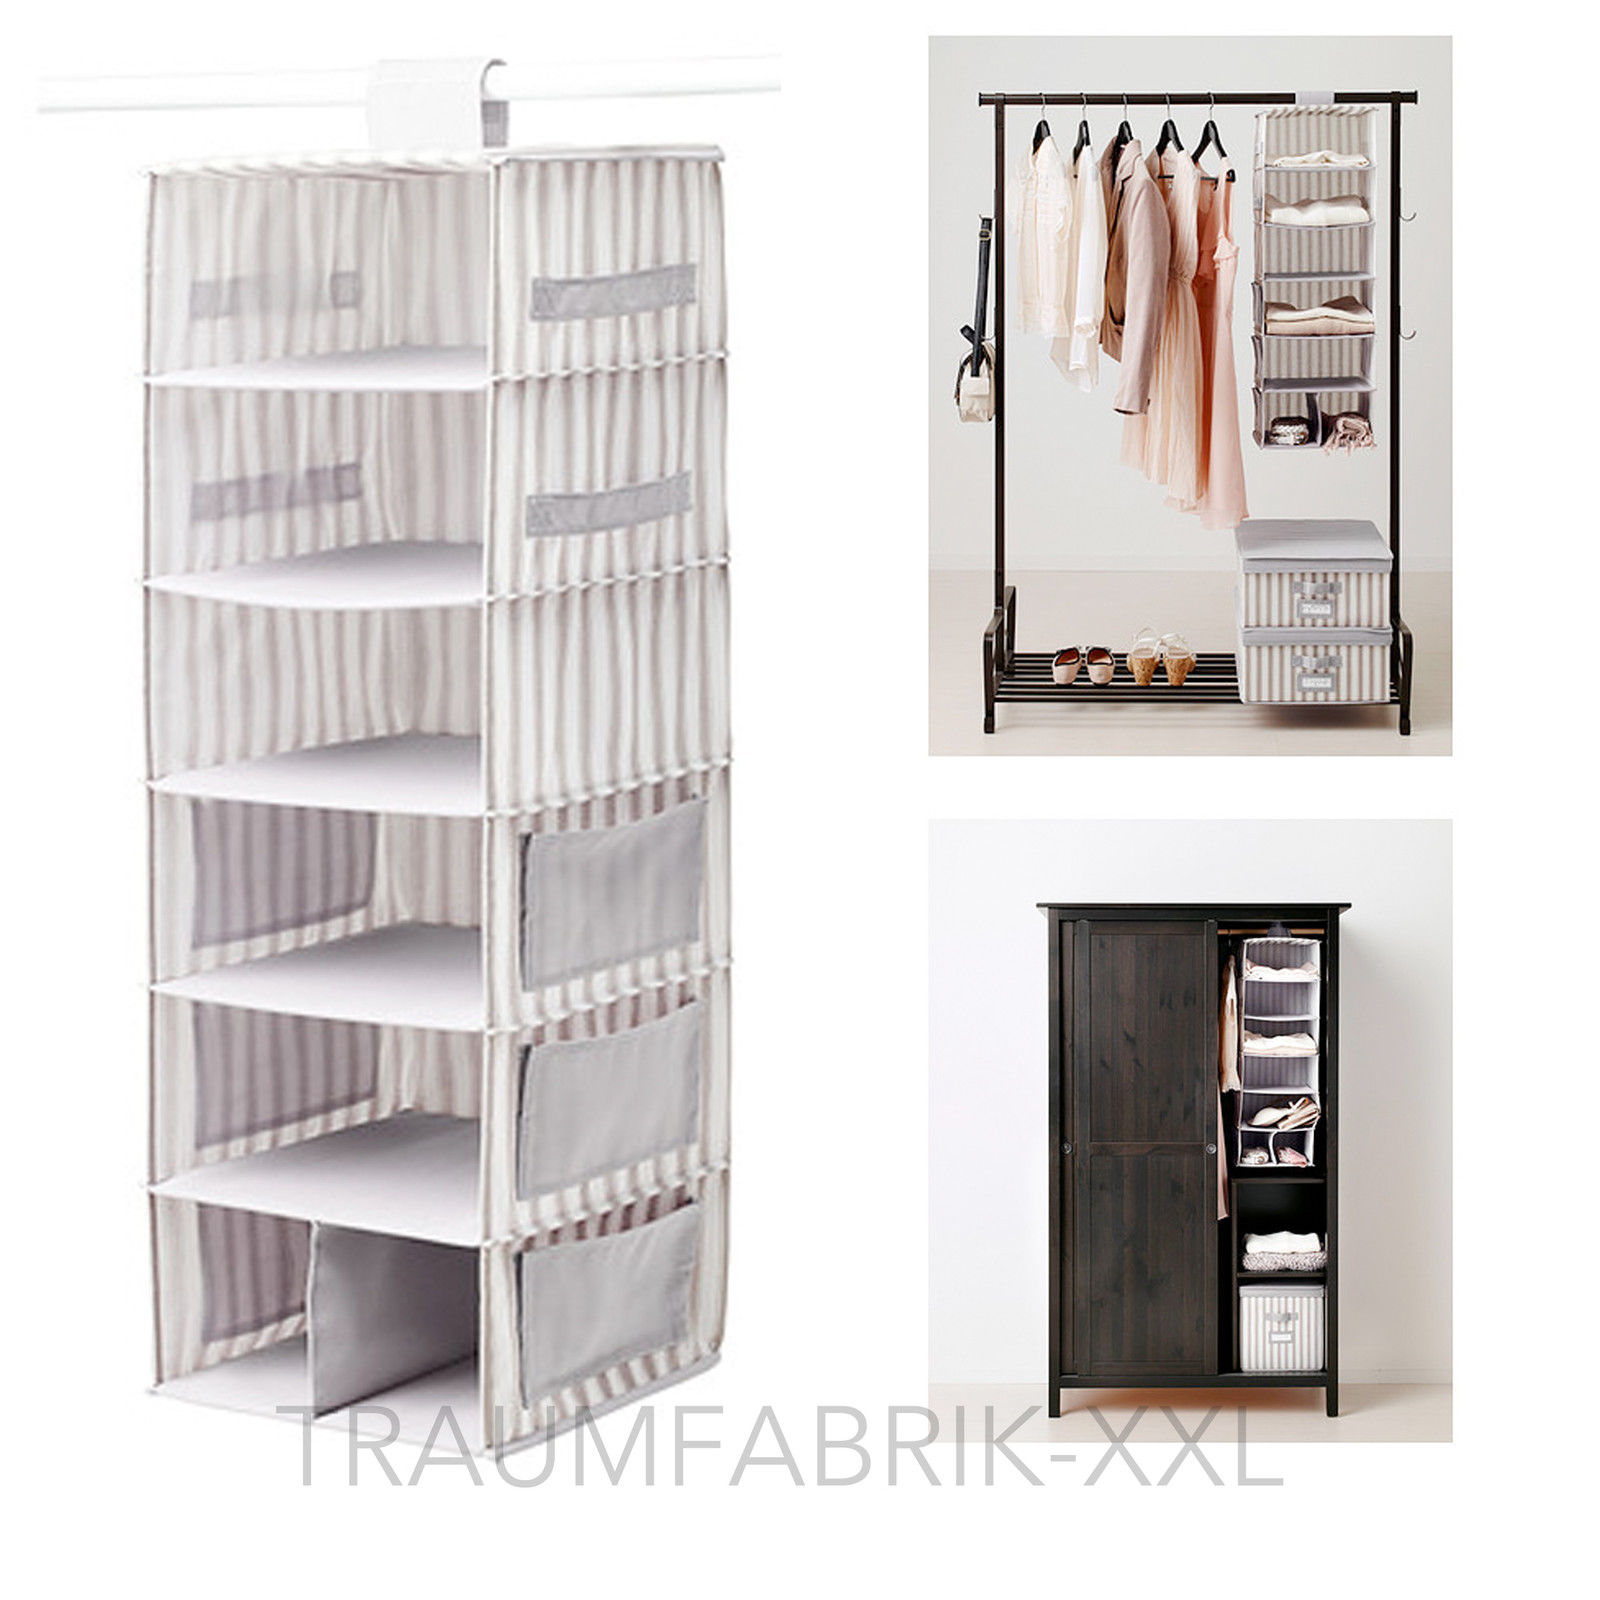 ikea h ngeaufbewahrung schuhregal regal garderobenh nger handtuchregal grau neu traumfabrik xxl. Black Bedroom Furniture Sets. Home Design Ideas